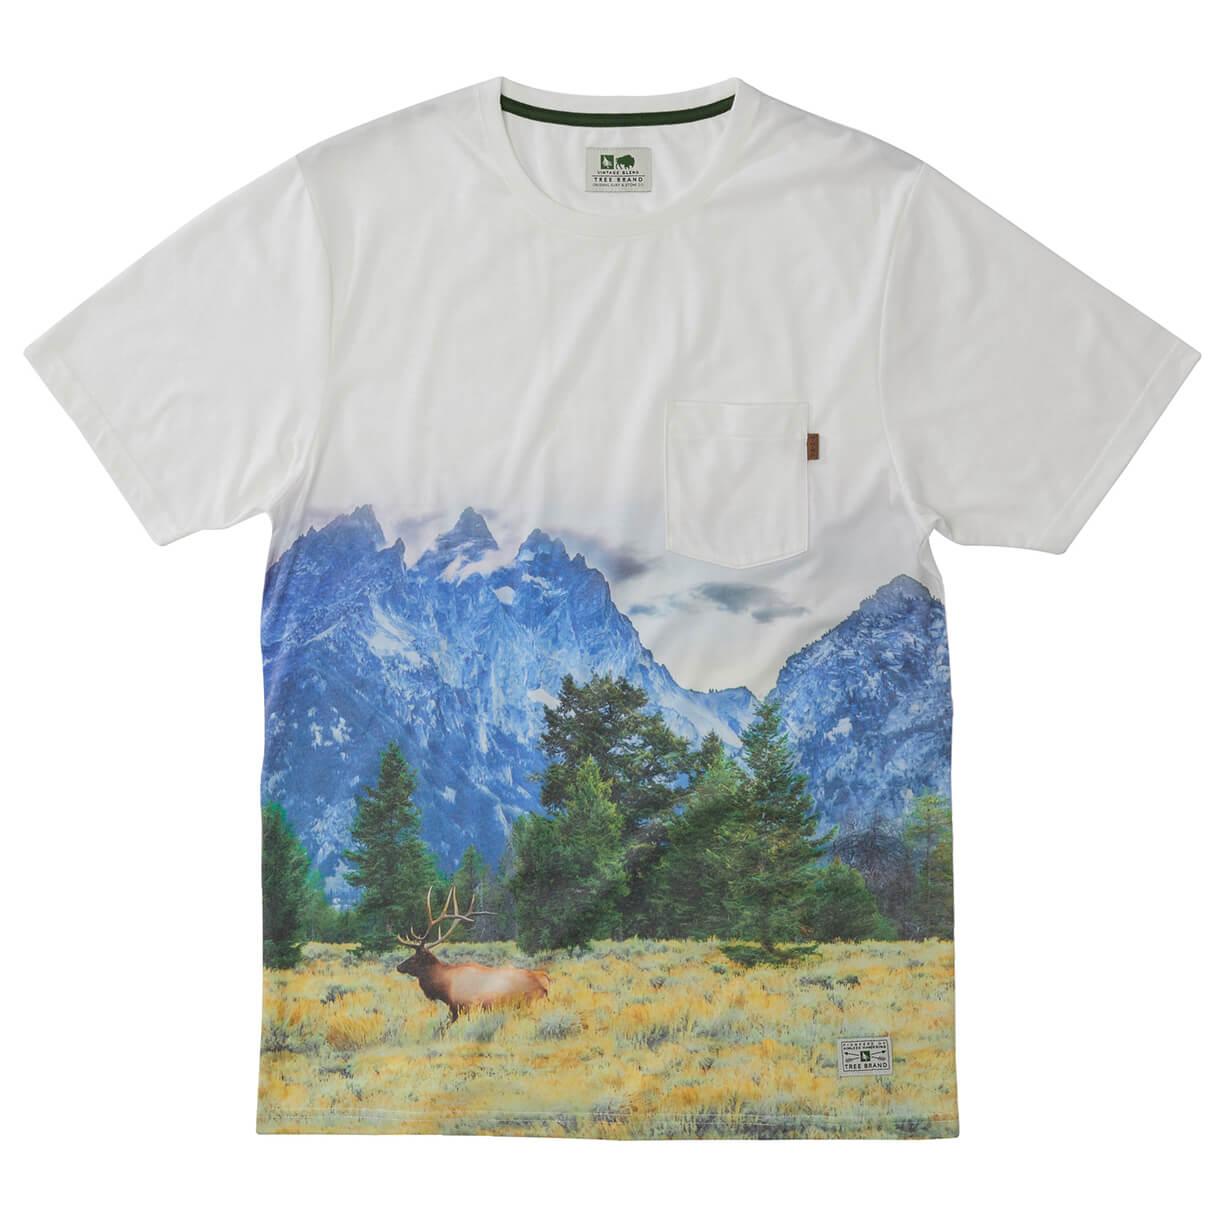 Hippy tree prairie tee t shirt homme achat en ligne for Hippie t shirts australia